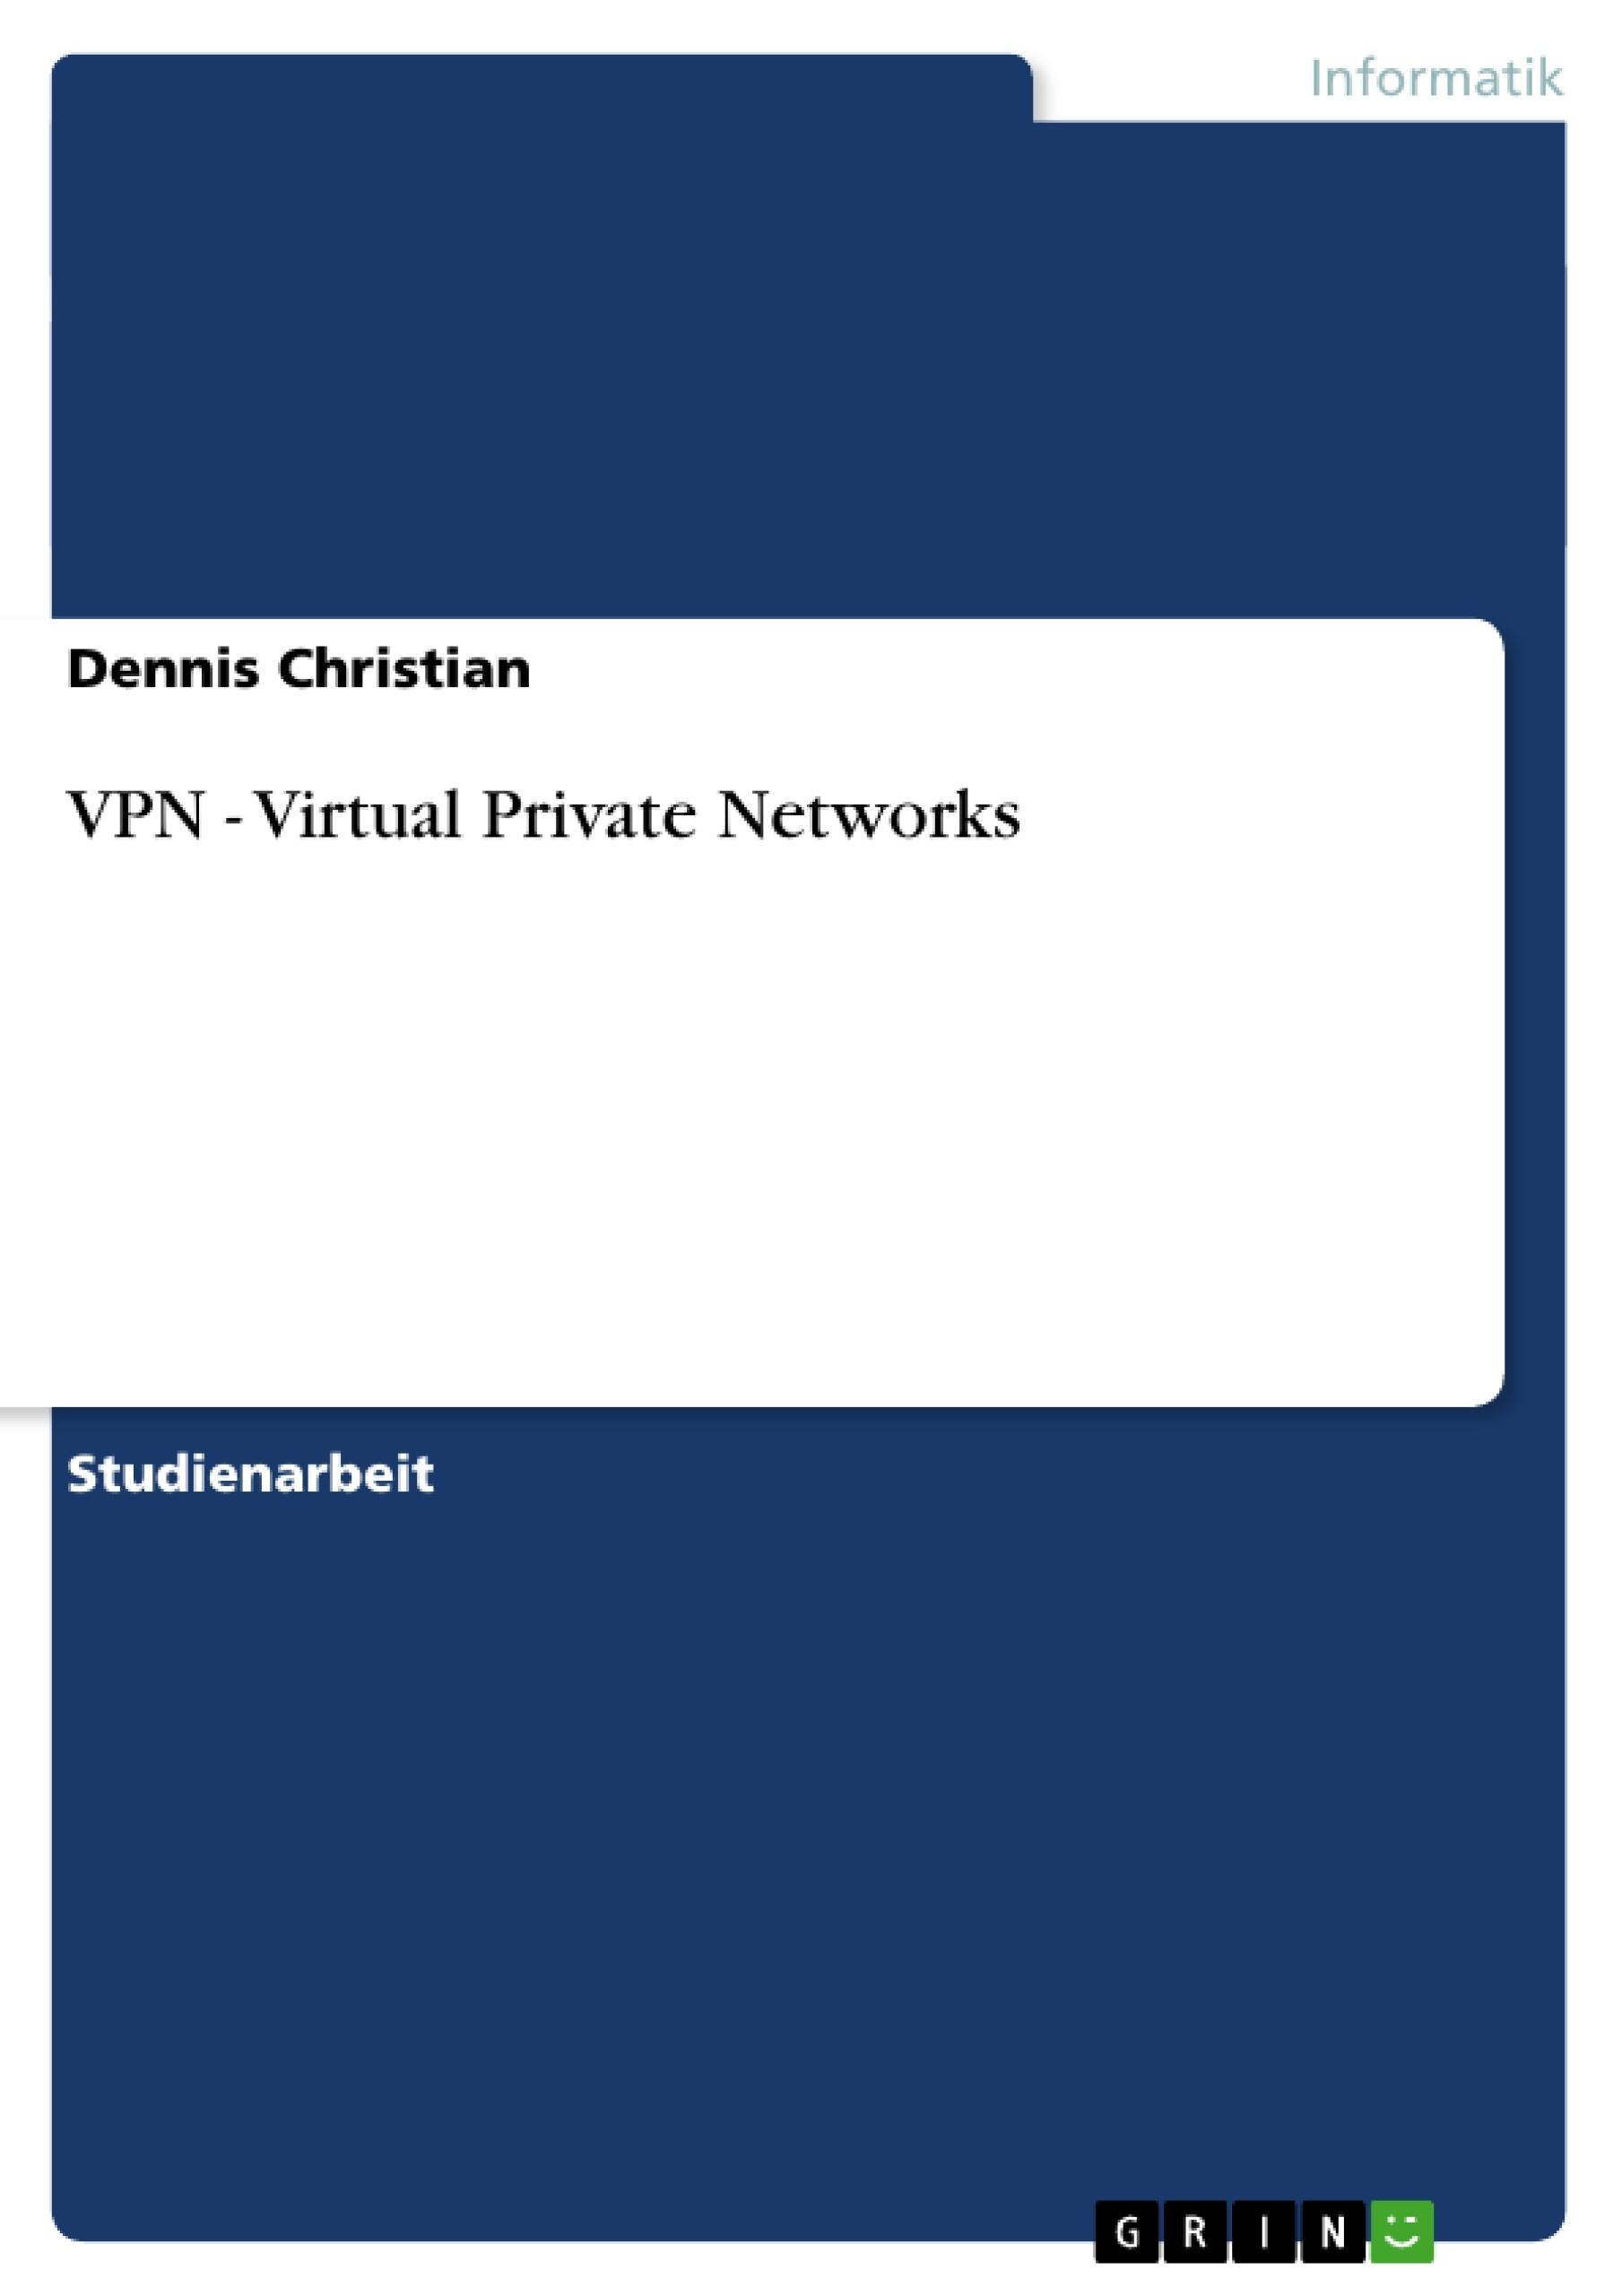 Titel: VPN - Virtual Private Networks